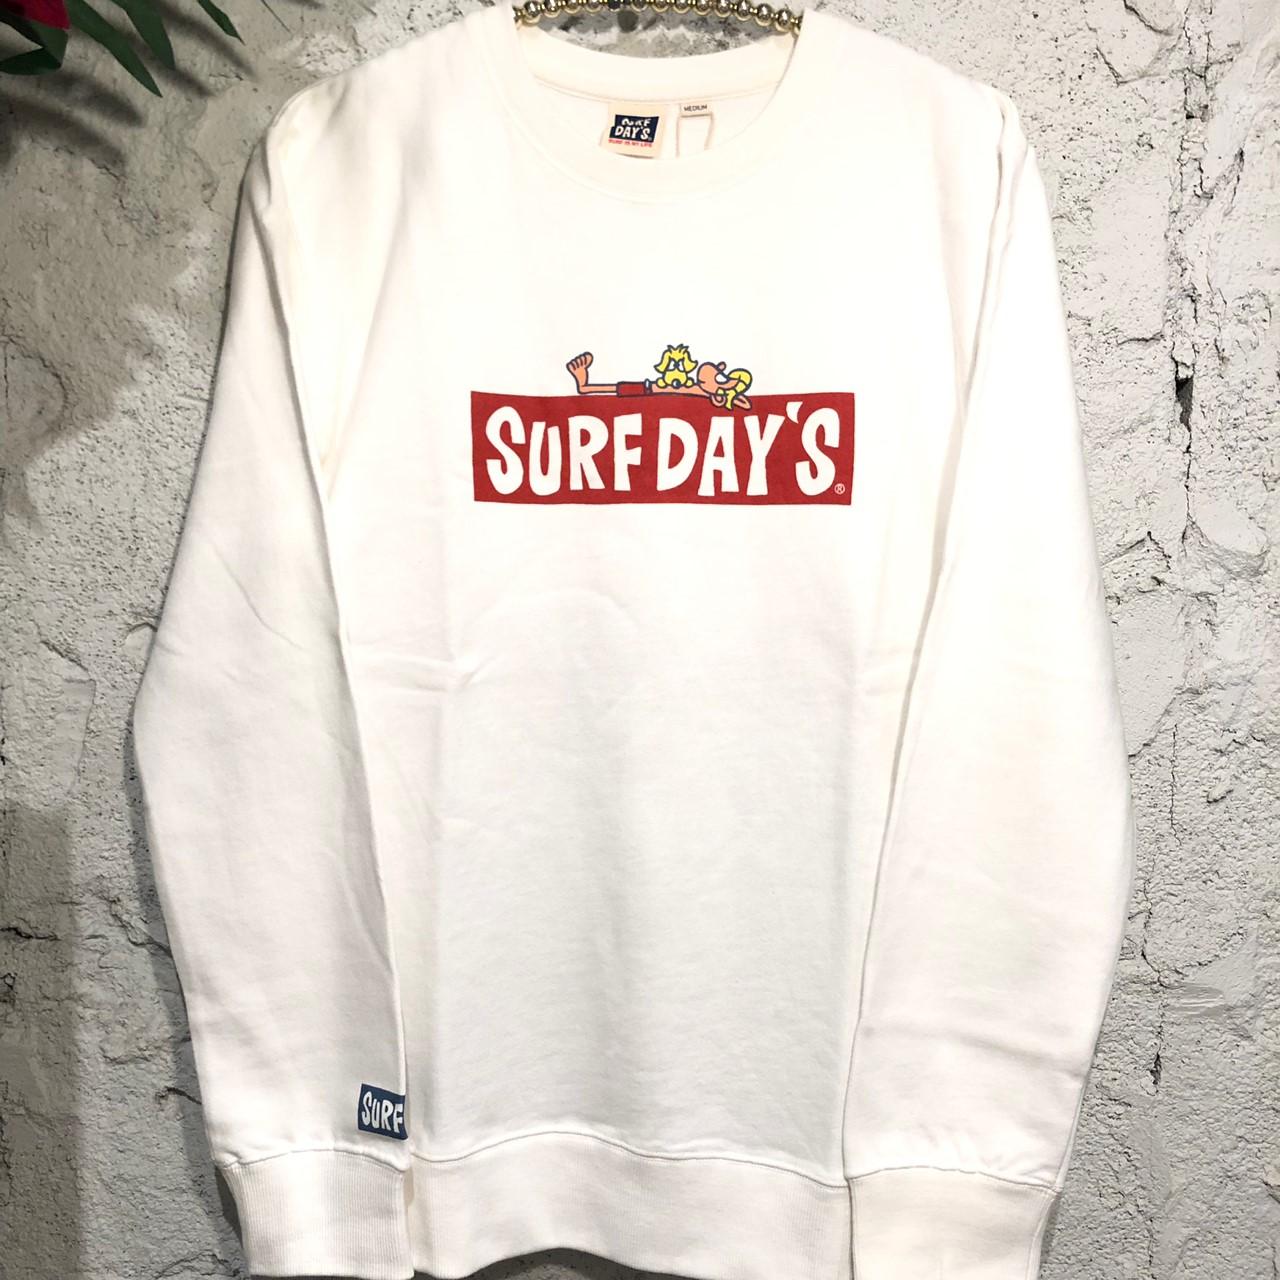 【SURF DAY'S】メンズトレーナー/M/L/